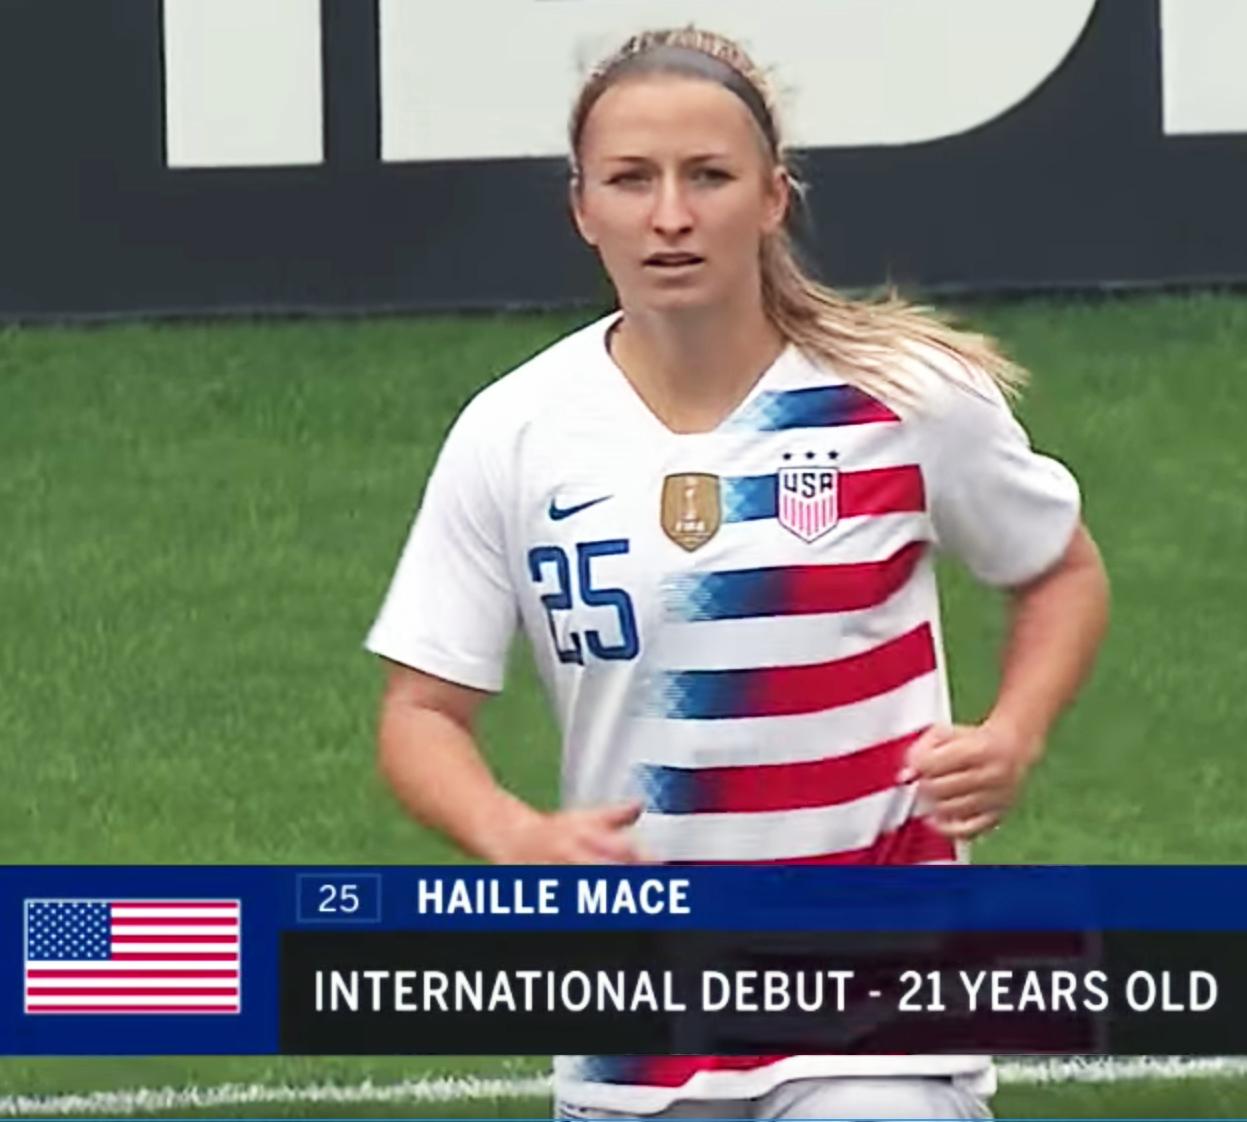 Haille Mace